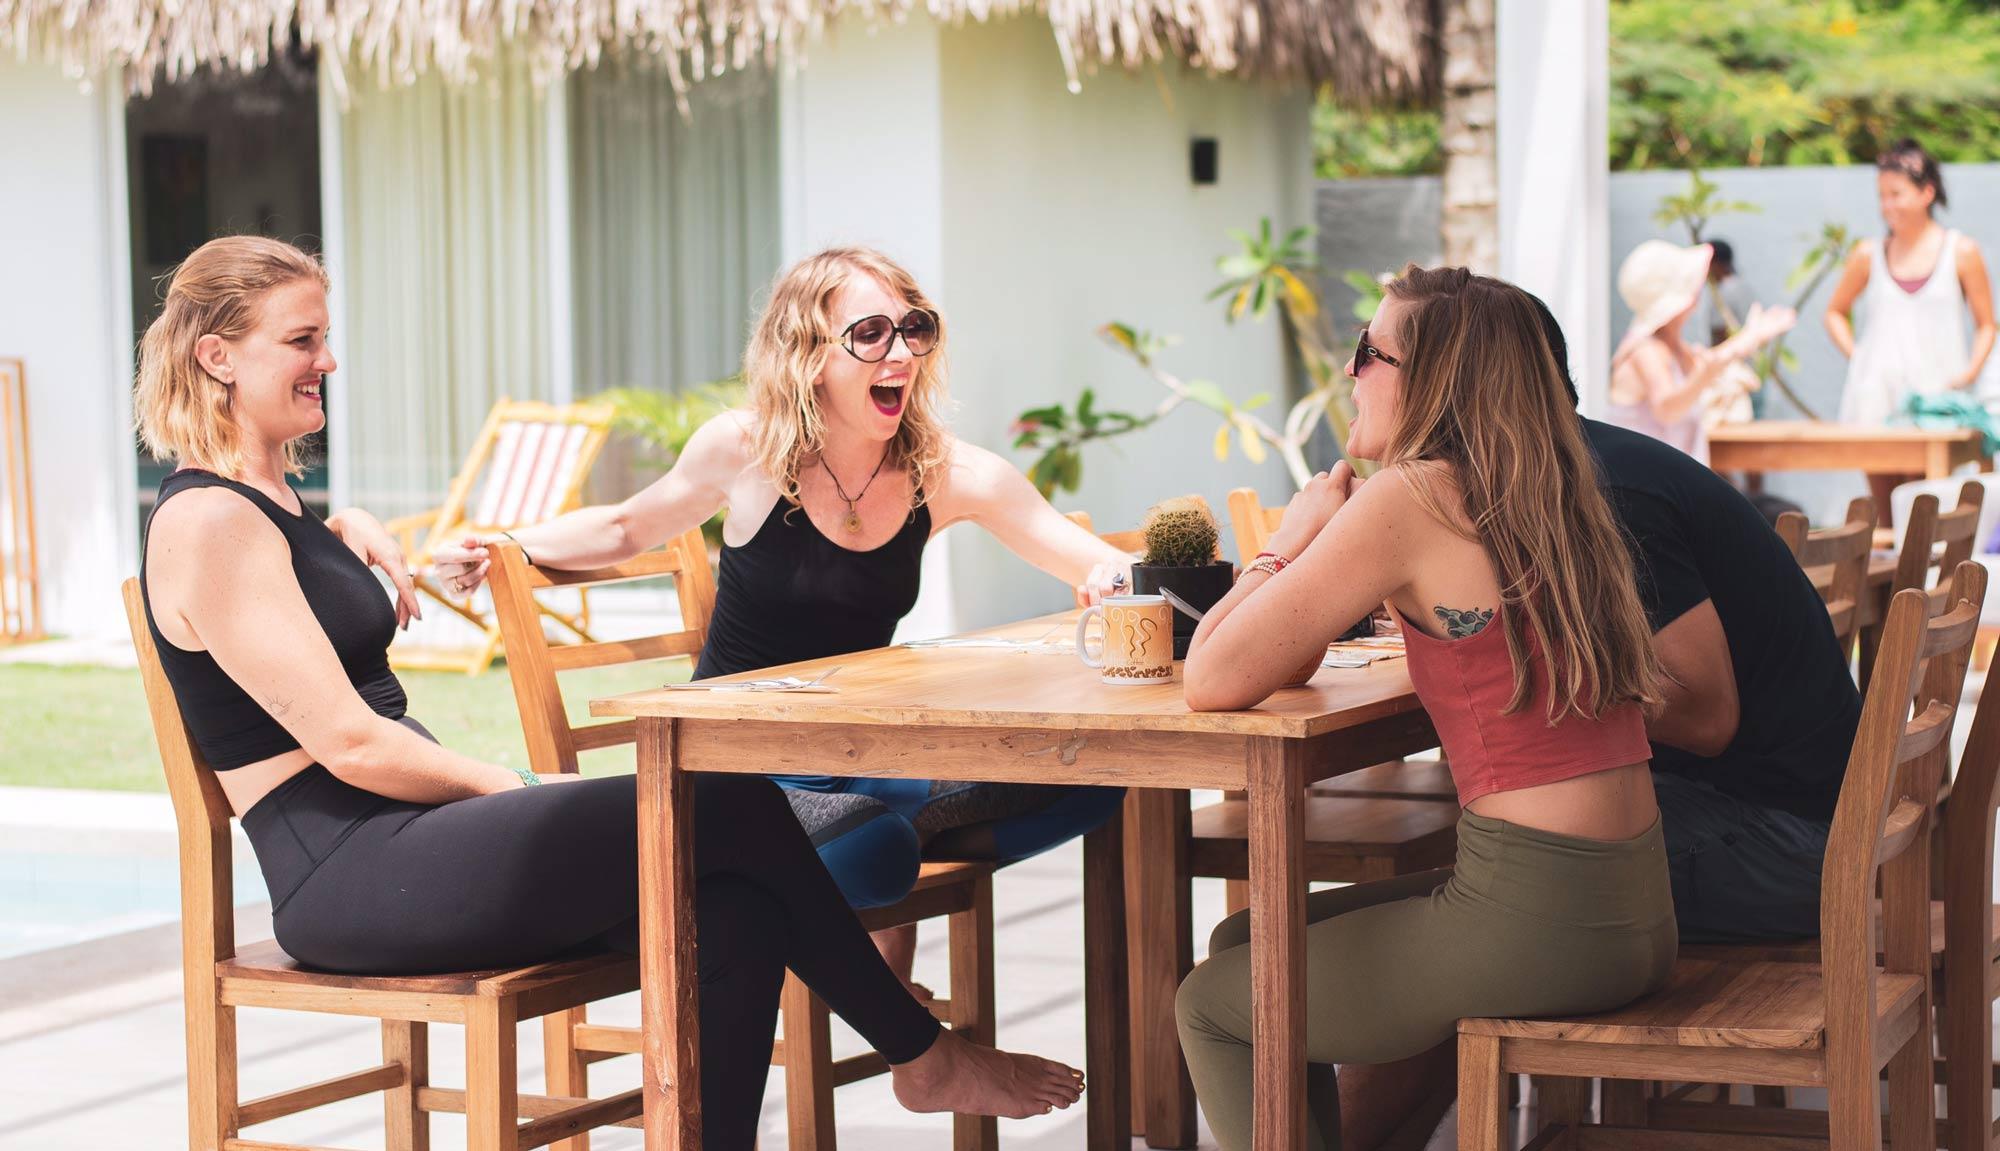 vikara-olon-ecuador-pool-yoga-surf-retreat-wellbeing